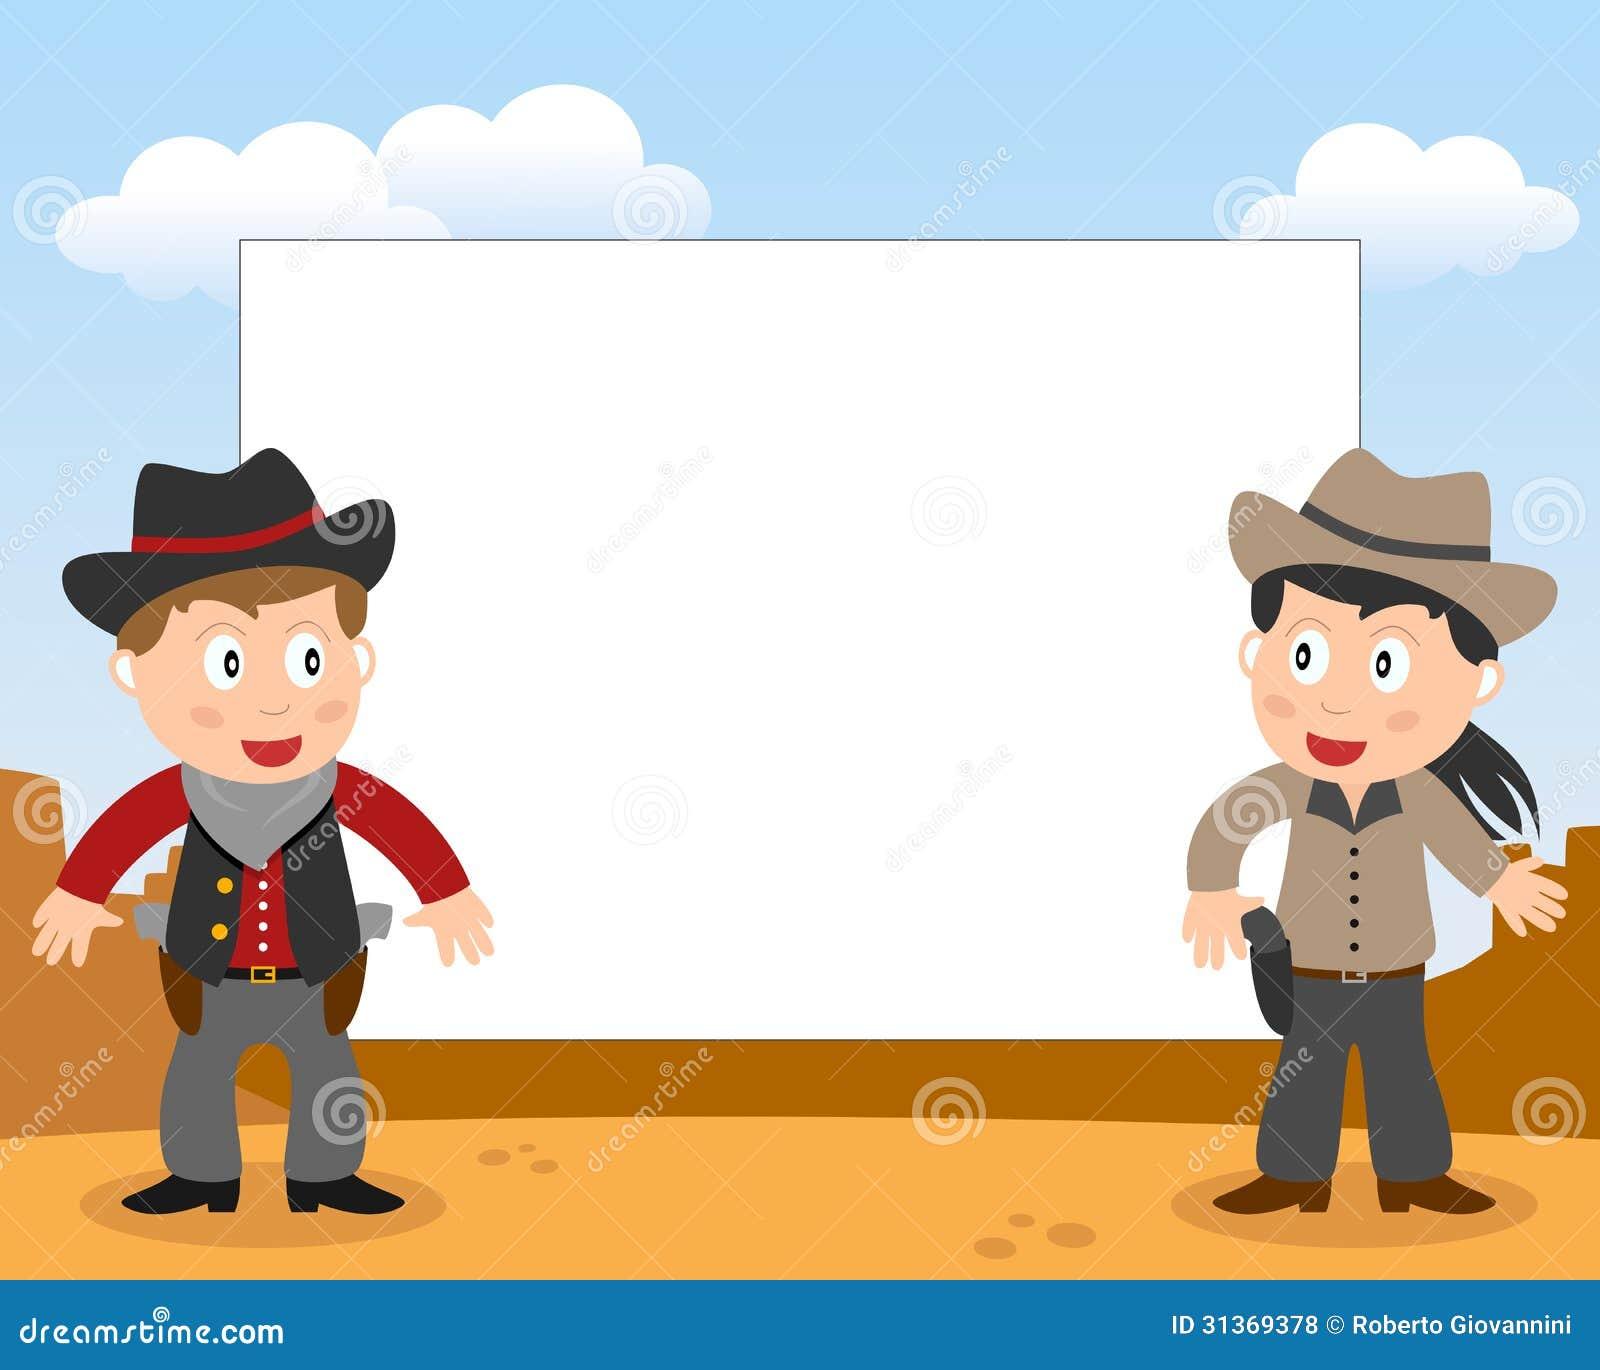 wild west cowboys photo frame stock vector illustration of handgun rh dreamstime com Cowboy Hat Clip Art Cartoon Cowboy